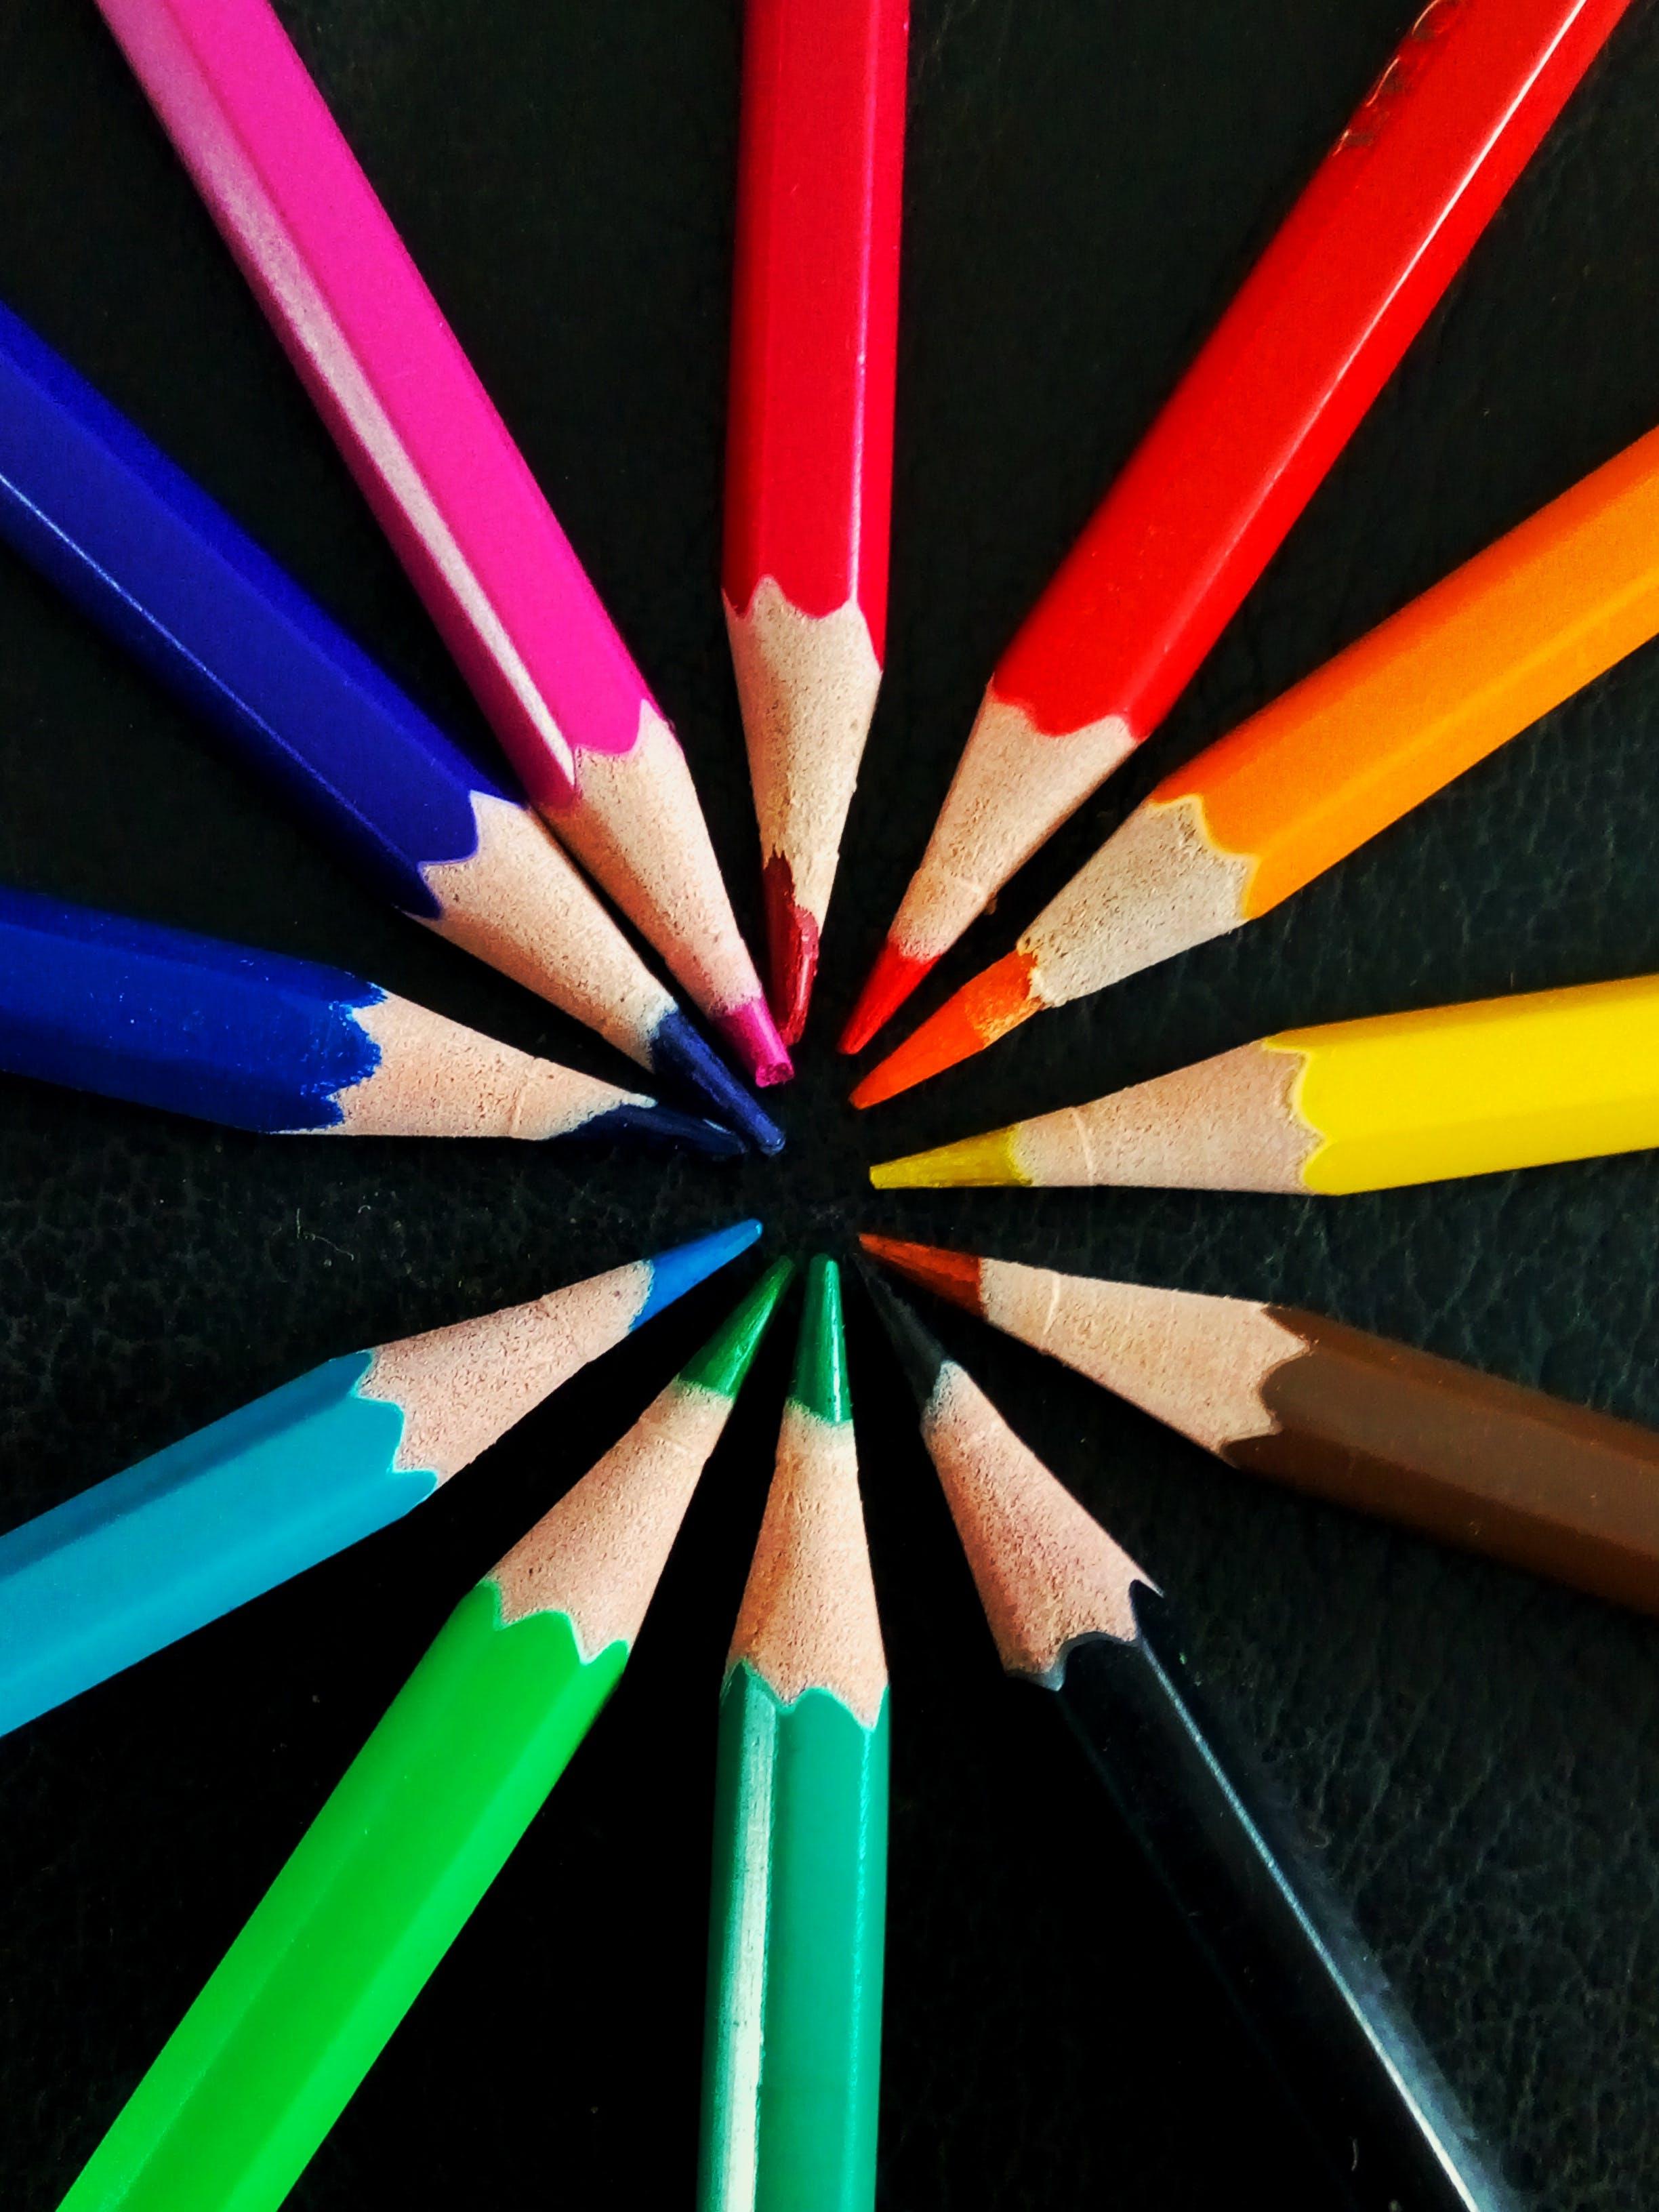 Free stock photo of color pencils, colors, pencils, wooden pencils